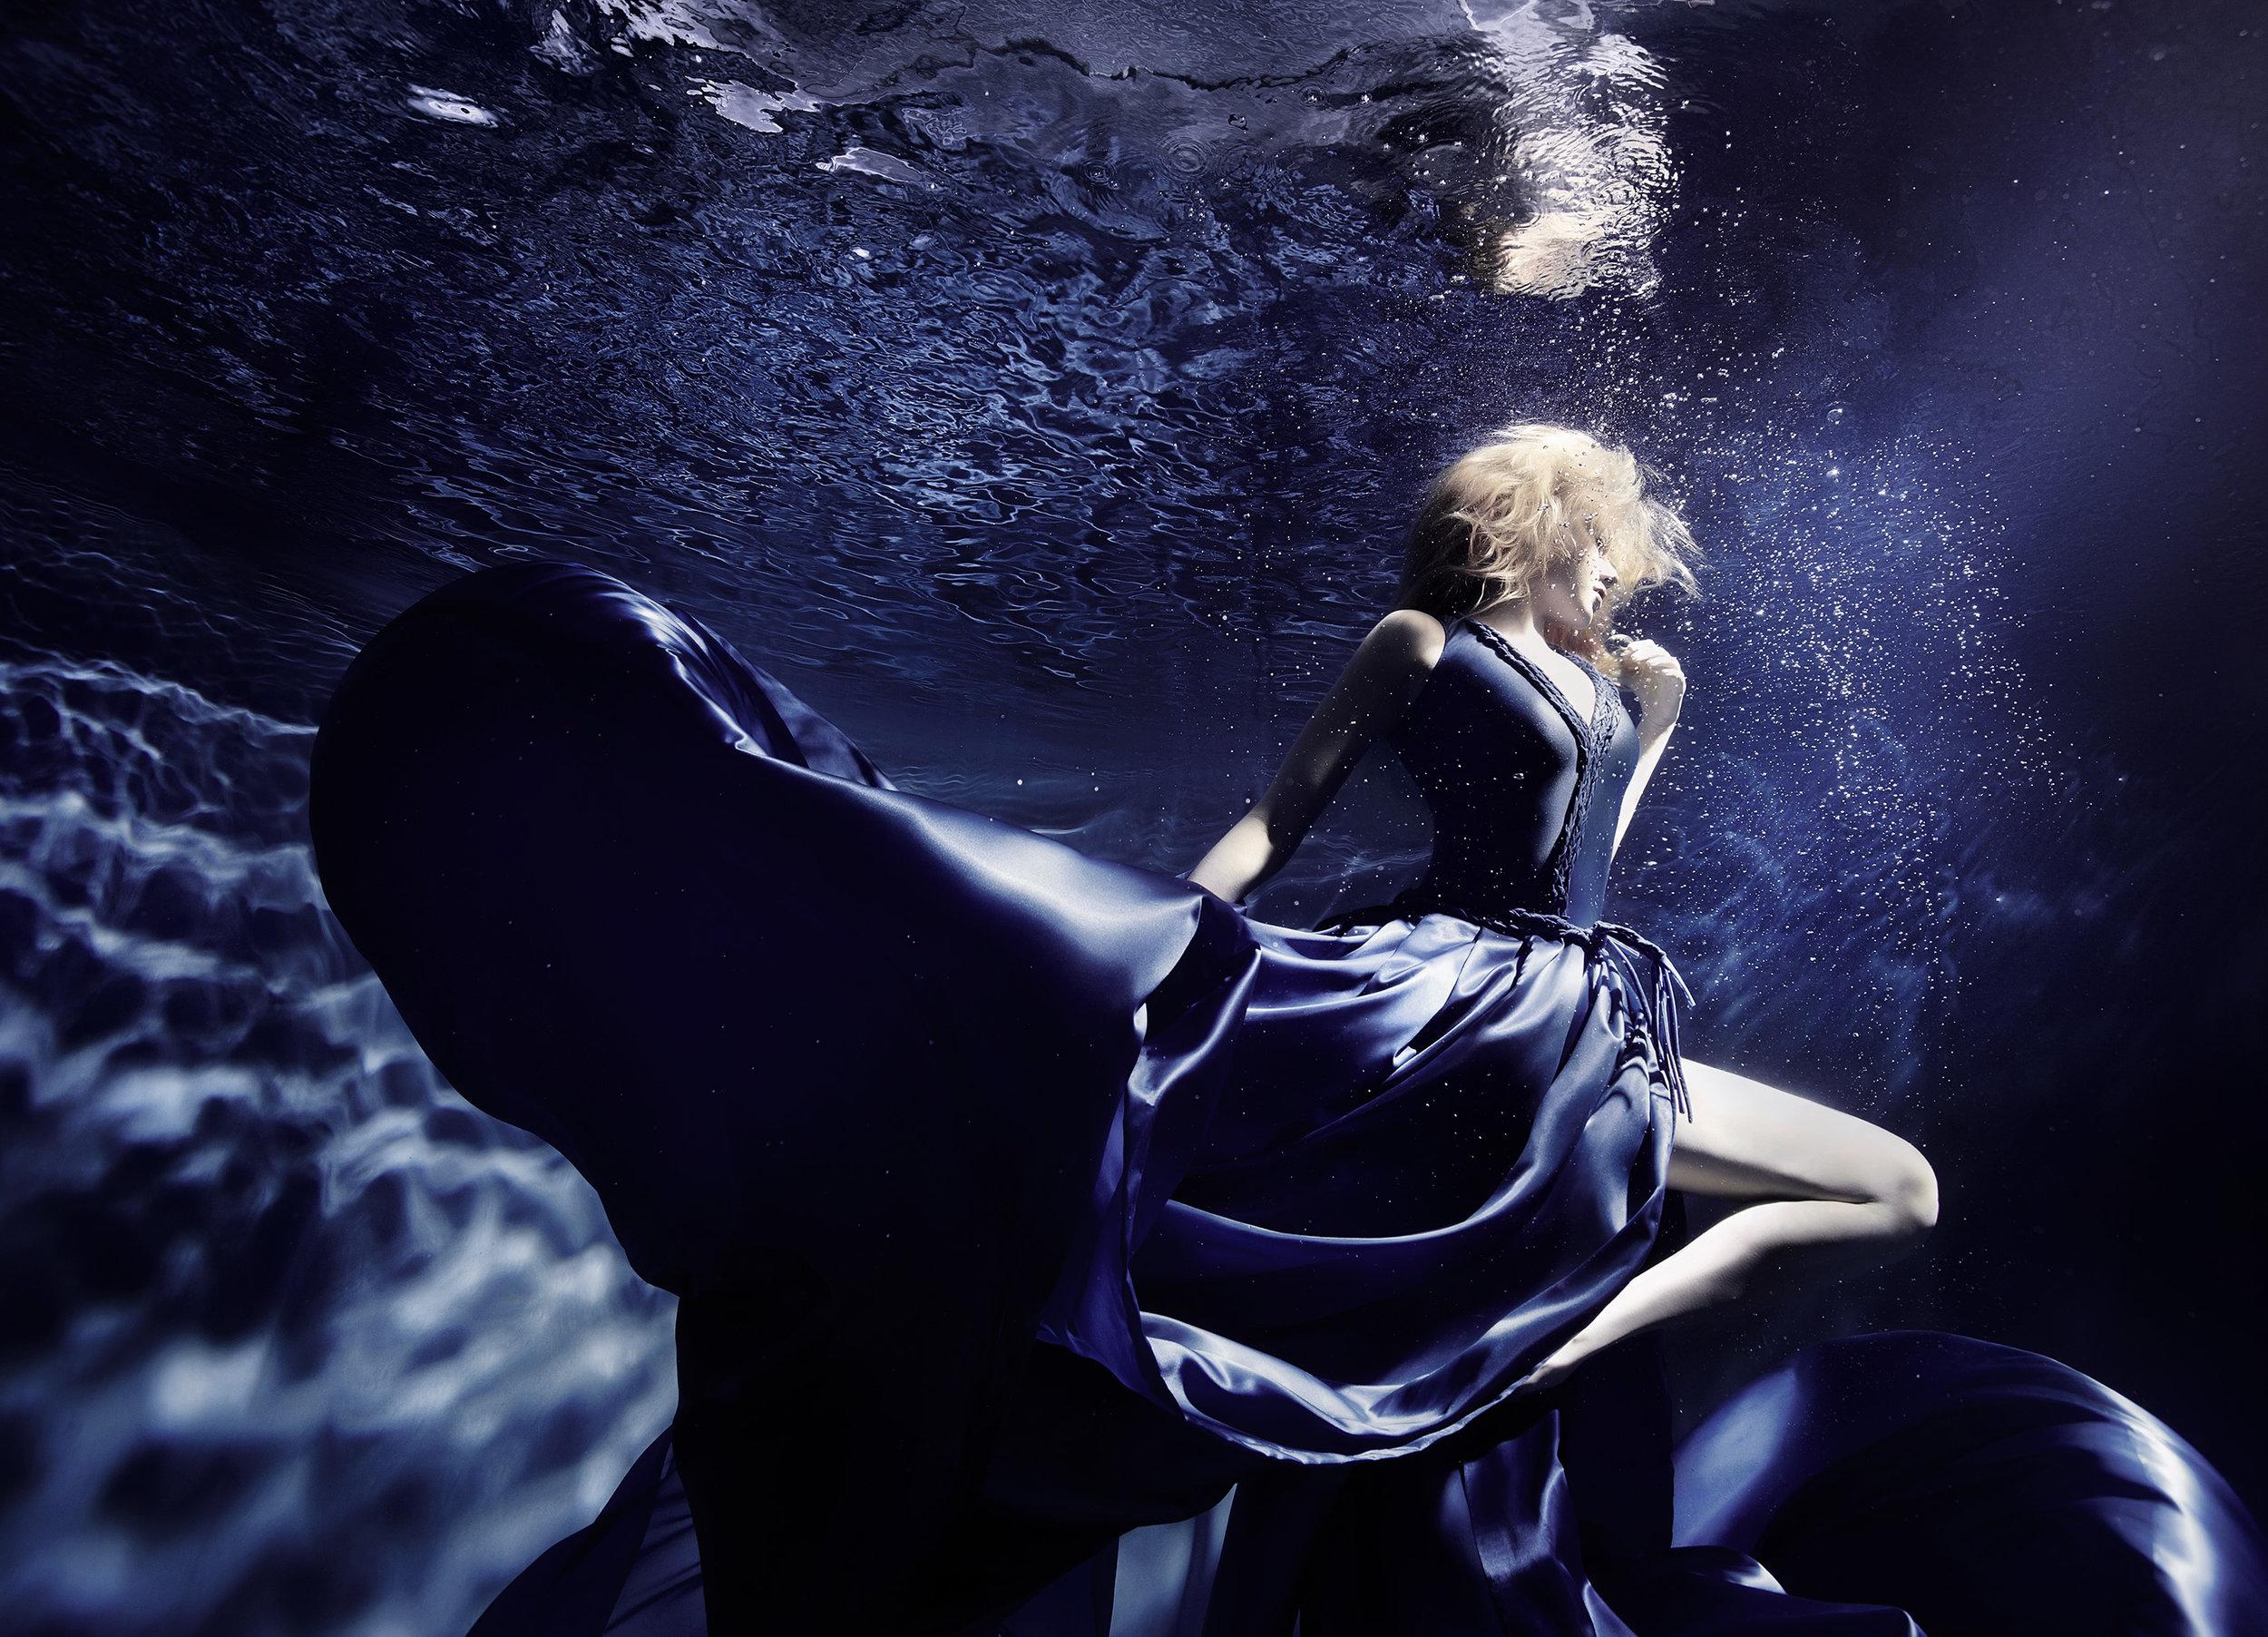 Susanne Stemmer girl dancing in blue dress underwater